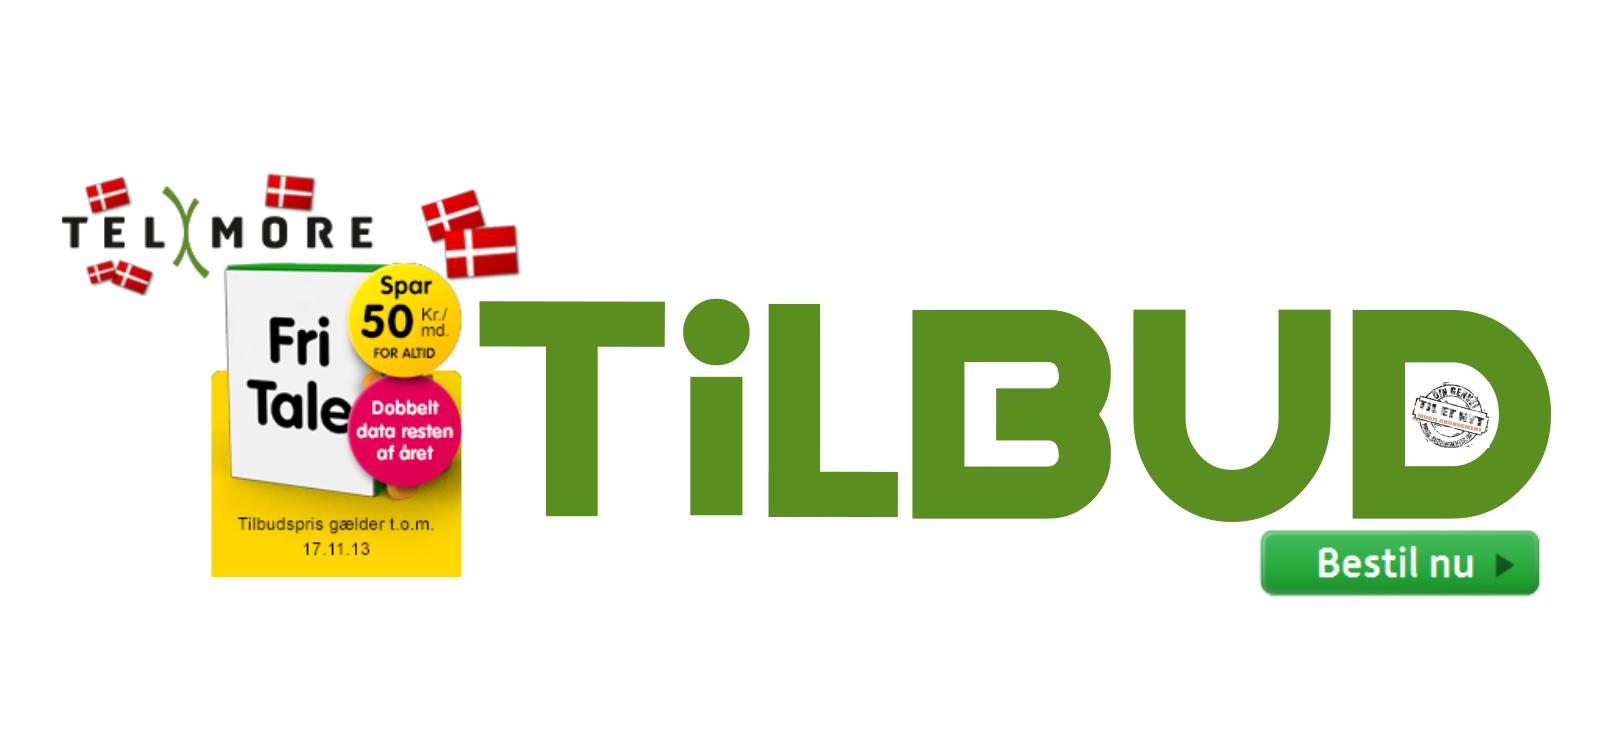 Telmore FRI TALE  kampagne tilbud